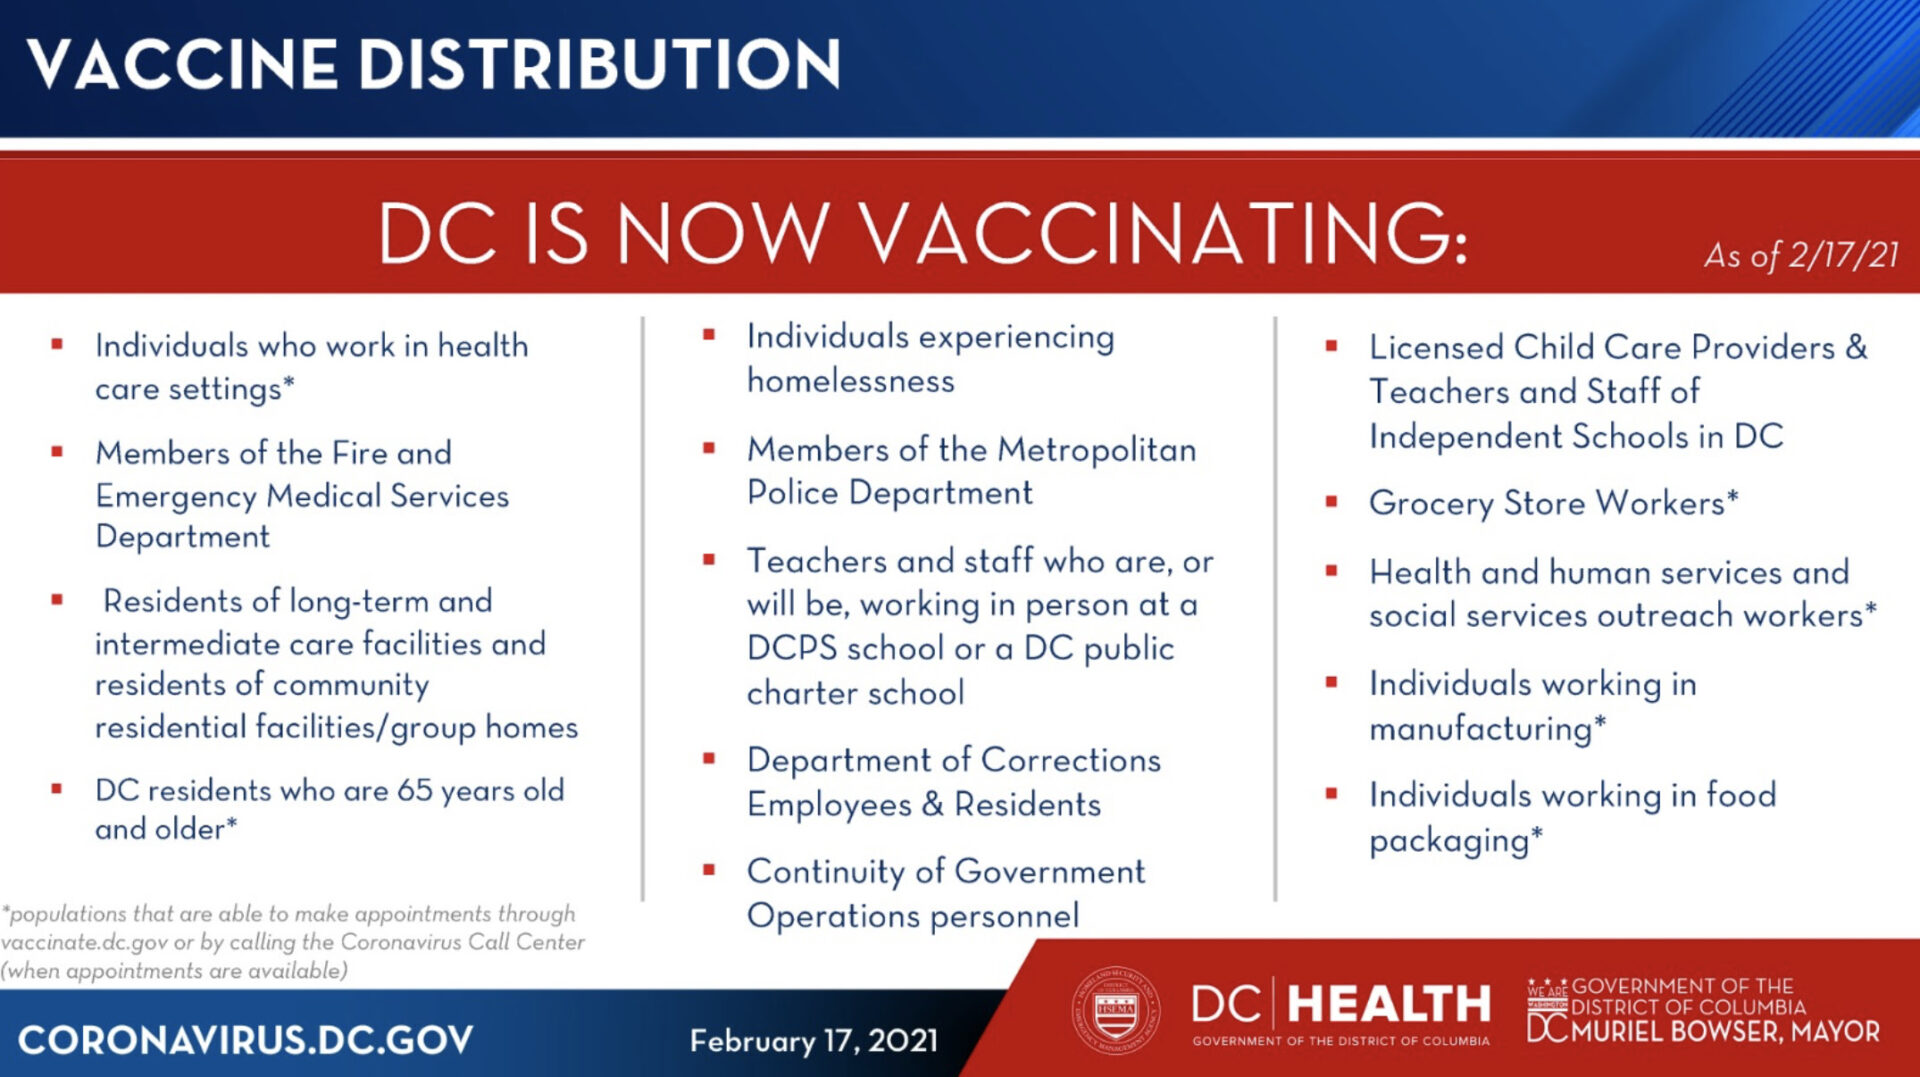 Vaccine Distribution